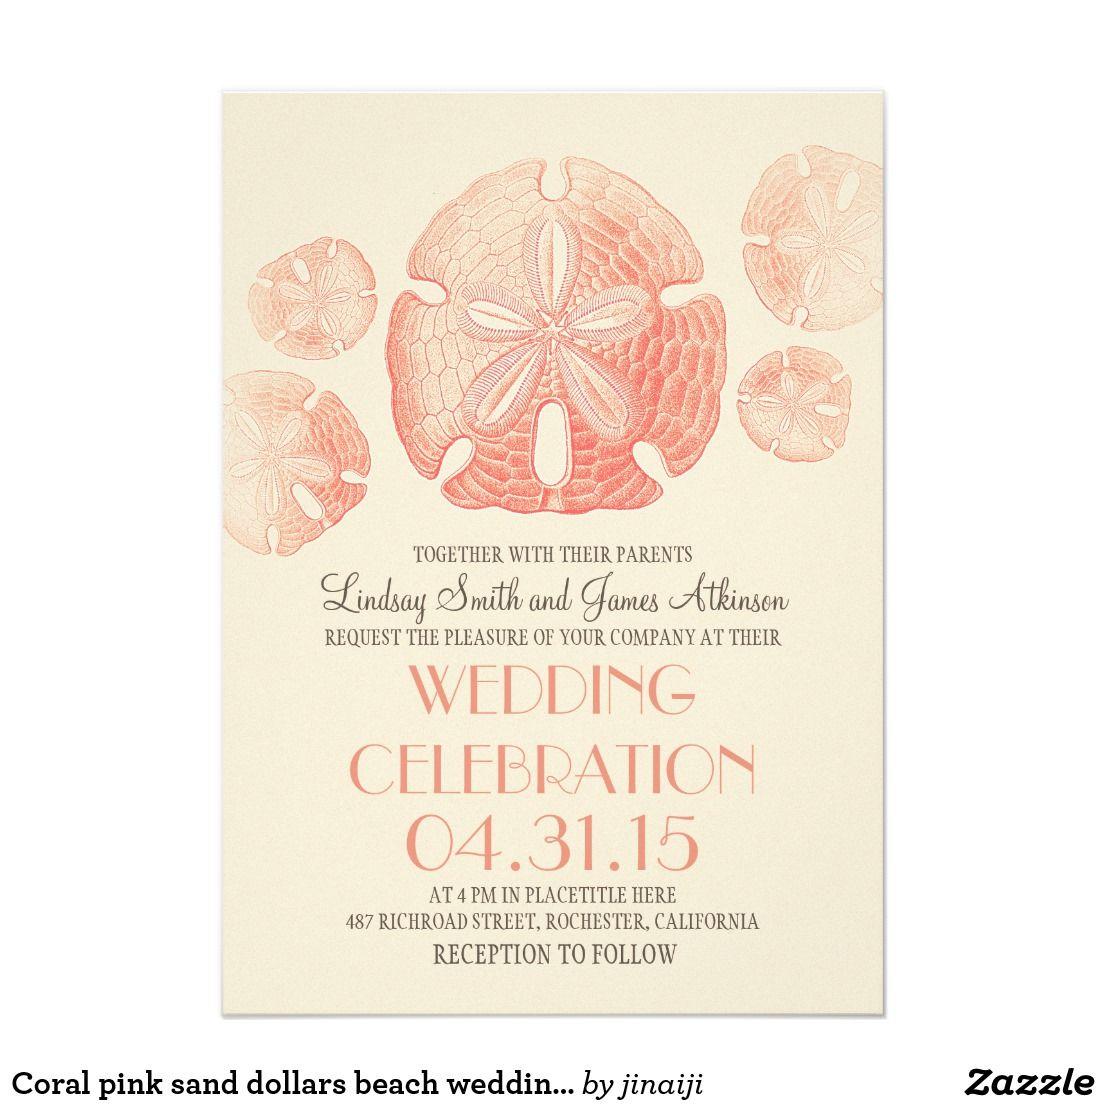 Coral pink sand dollars beach wedding invites | { Wedding ...